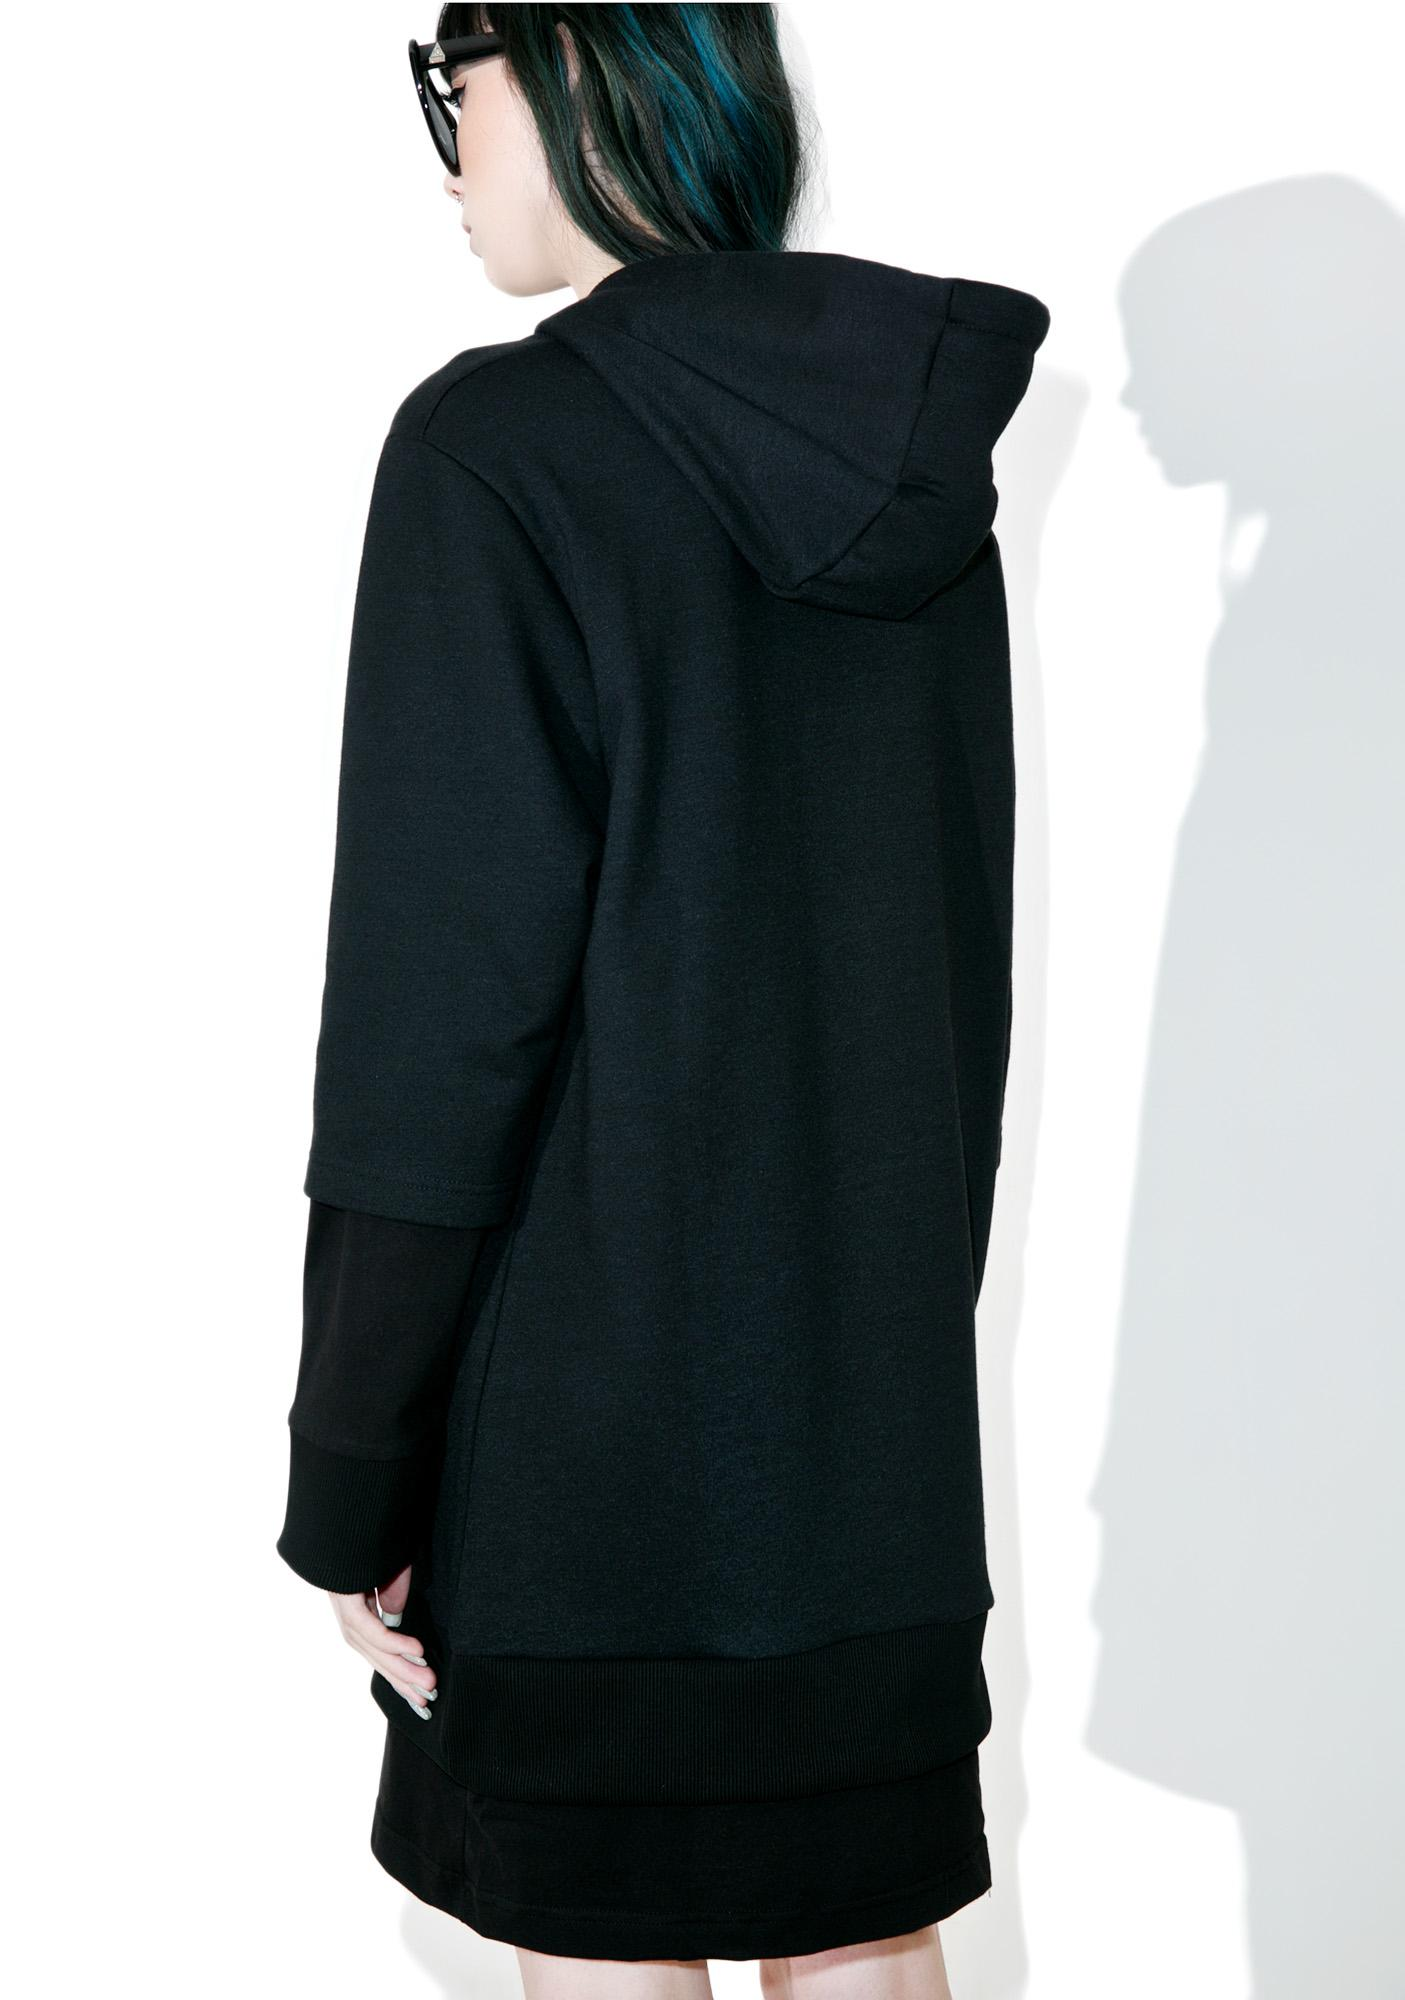 Disturbia Anti-Socialite Hoodie Dress